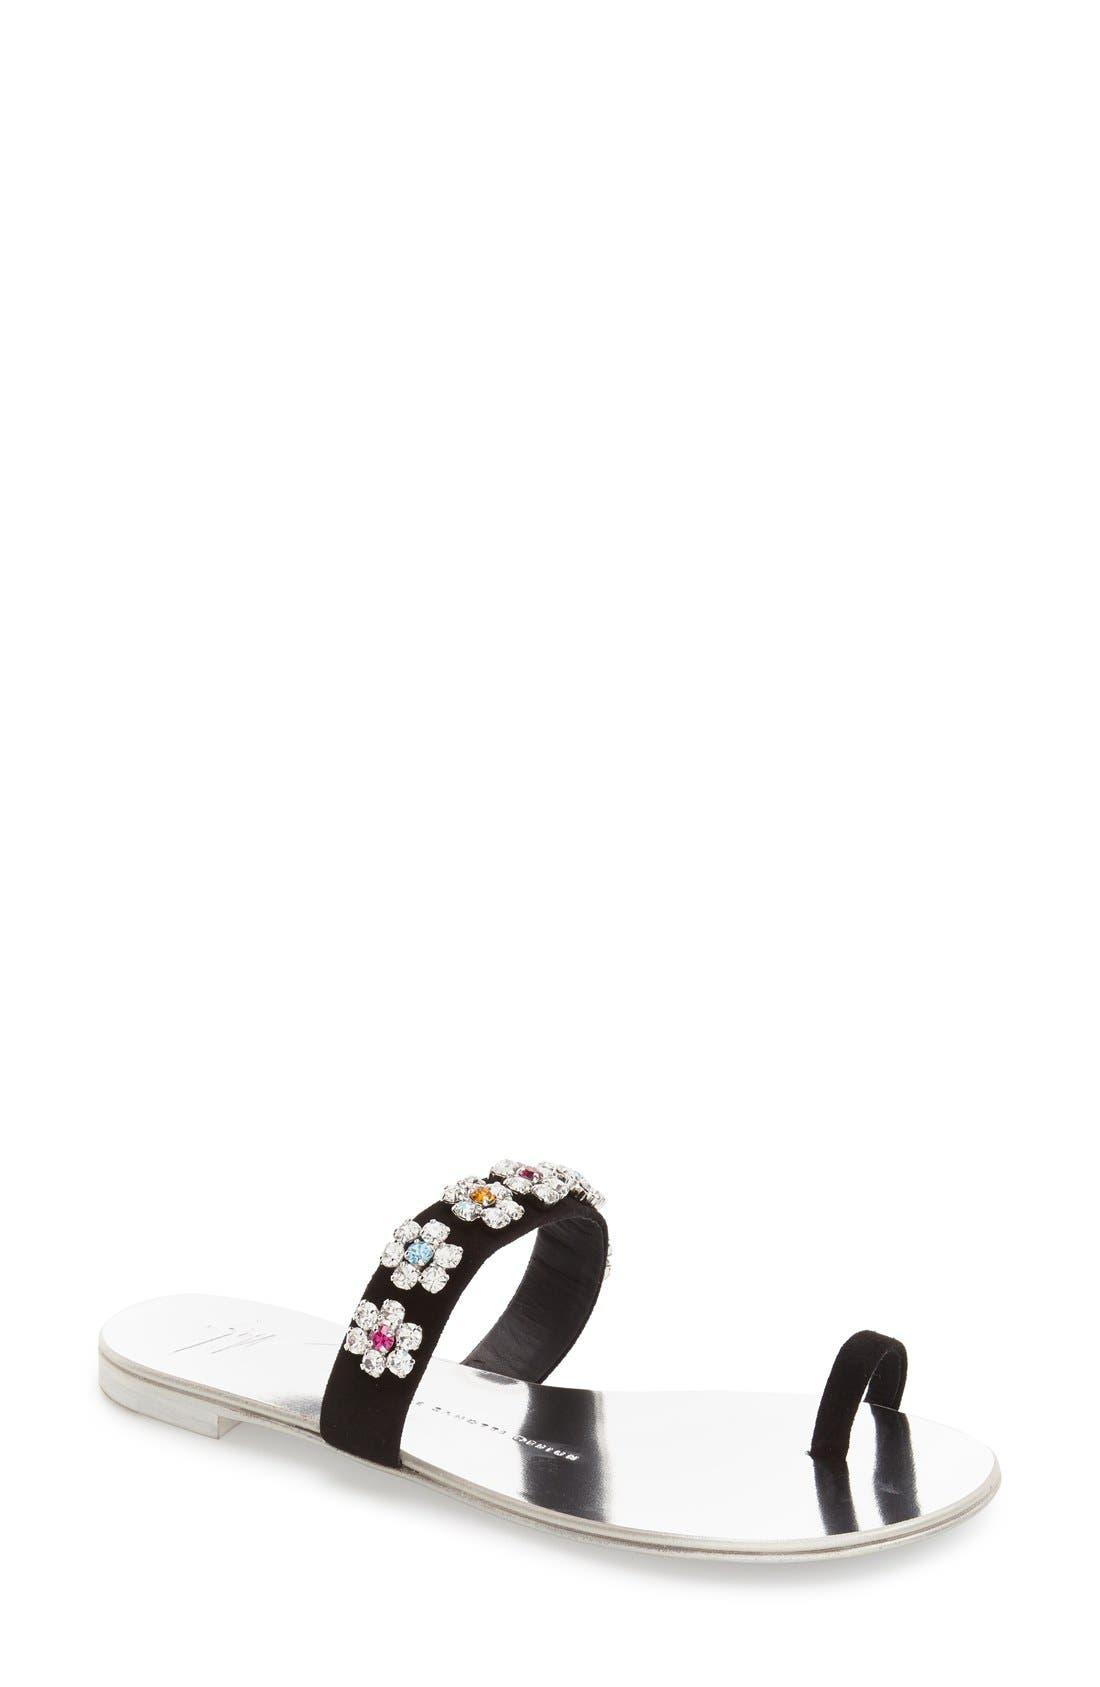 Alternate Image 1 Selected - Giuseppe Zanotti Crystal Embellished Flat Sandal (Women)